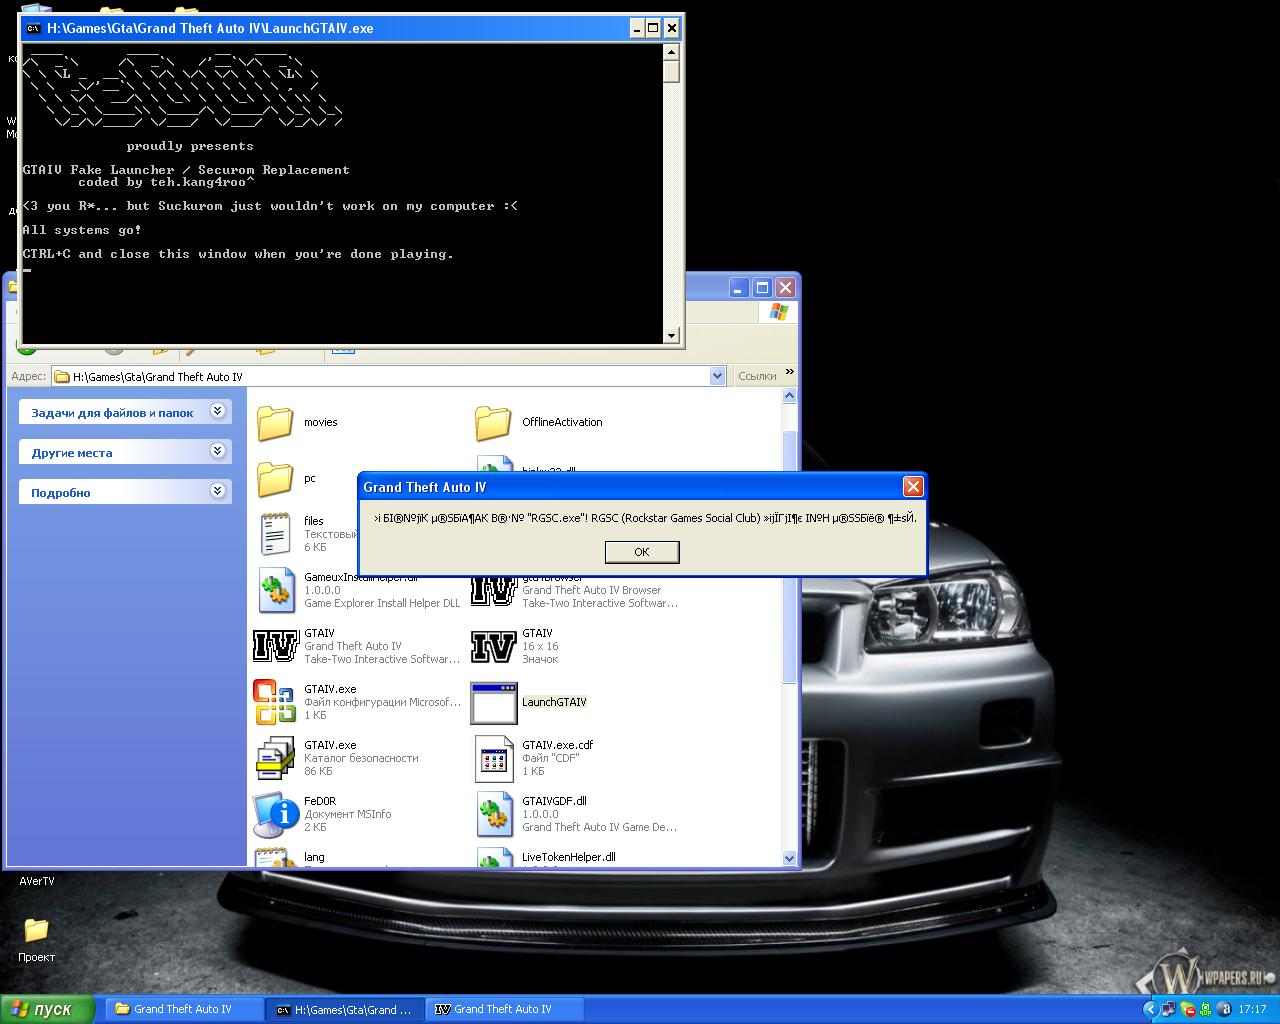 Патч GTA 4 v1.0.6.1 Русская версия. программу для вклейки патчей vkp.